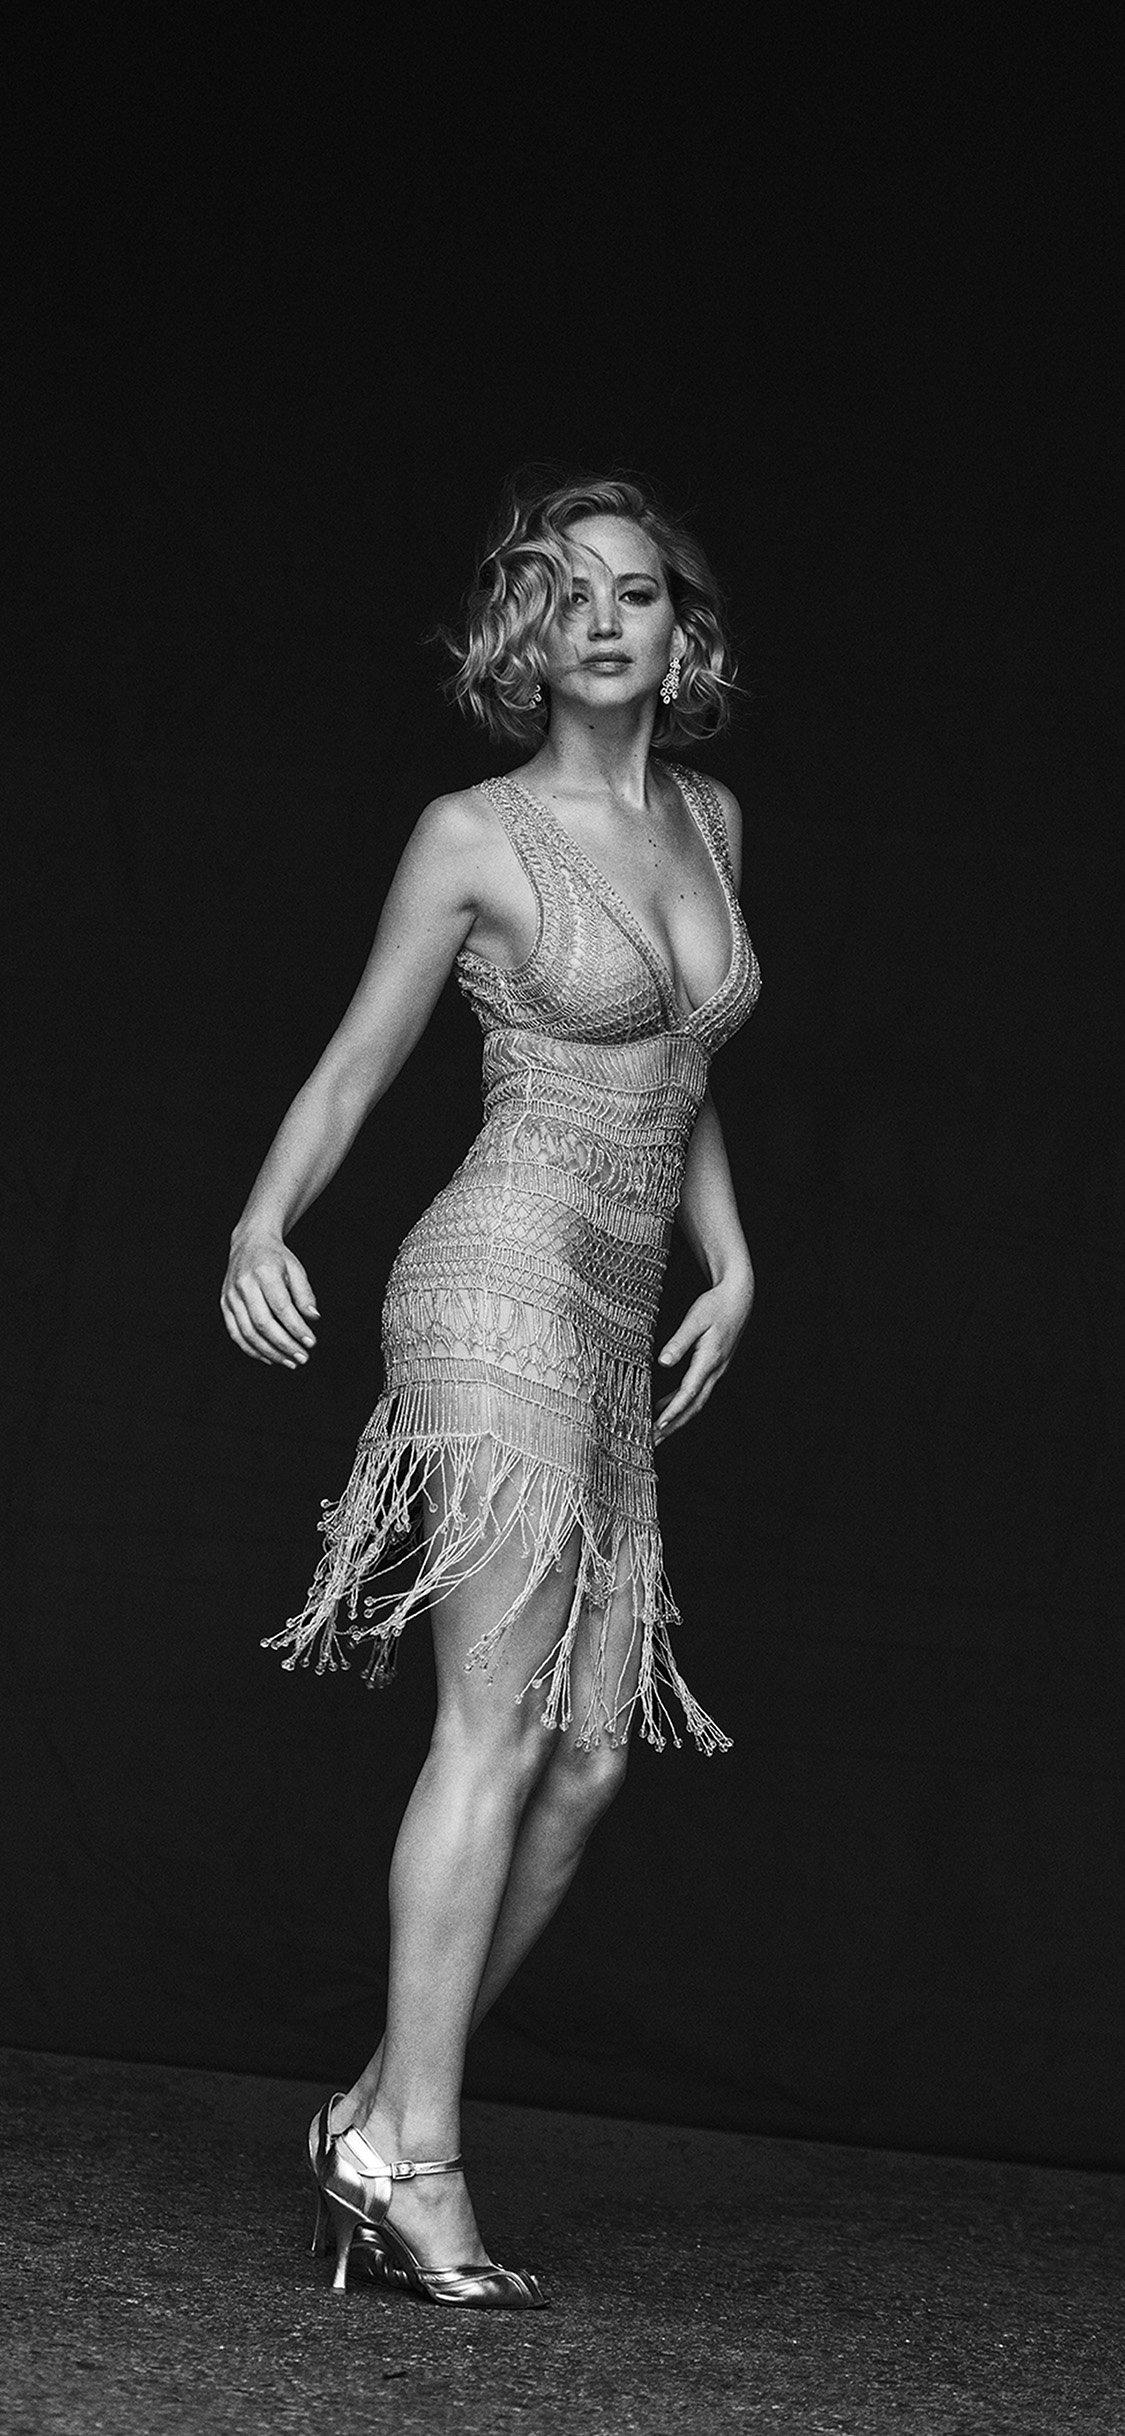 Jennifer Lawrence Shoot Black And White , HD Wallpaper & Backgrounds